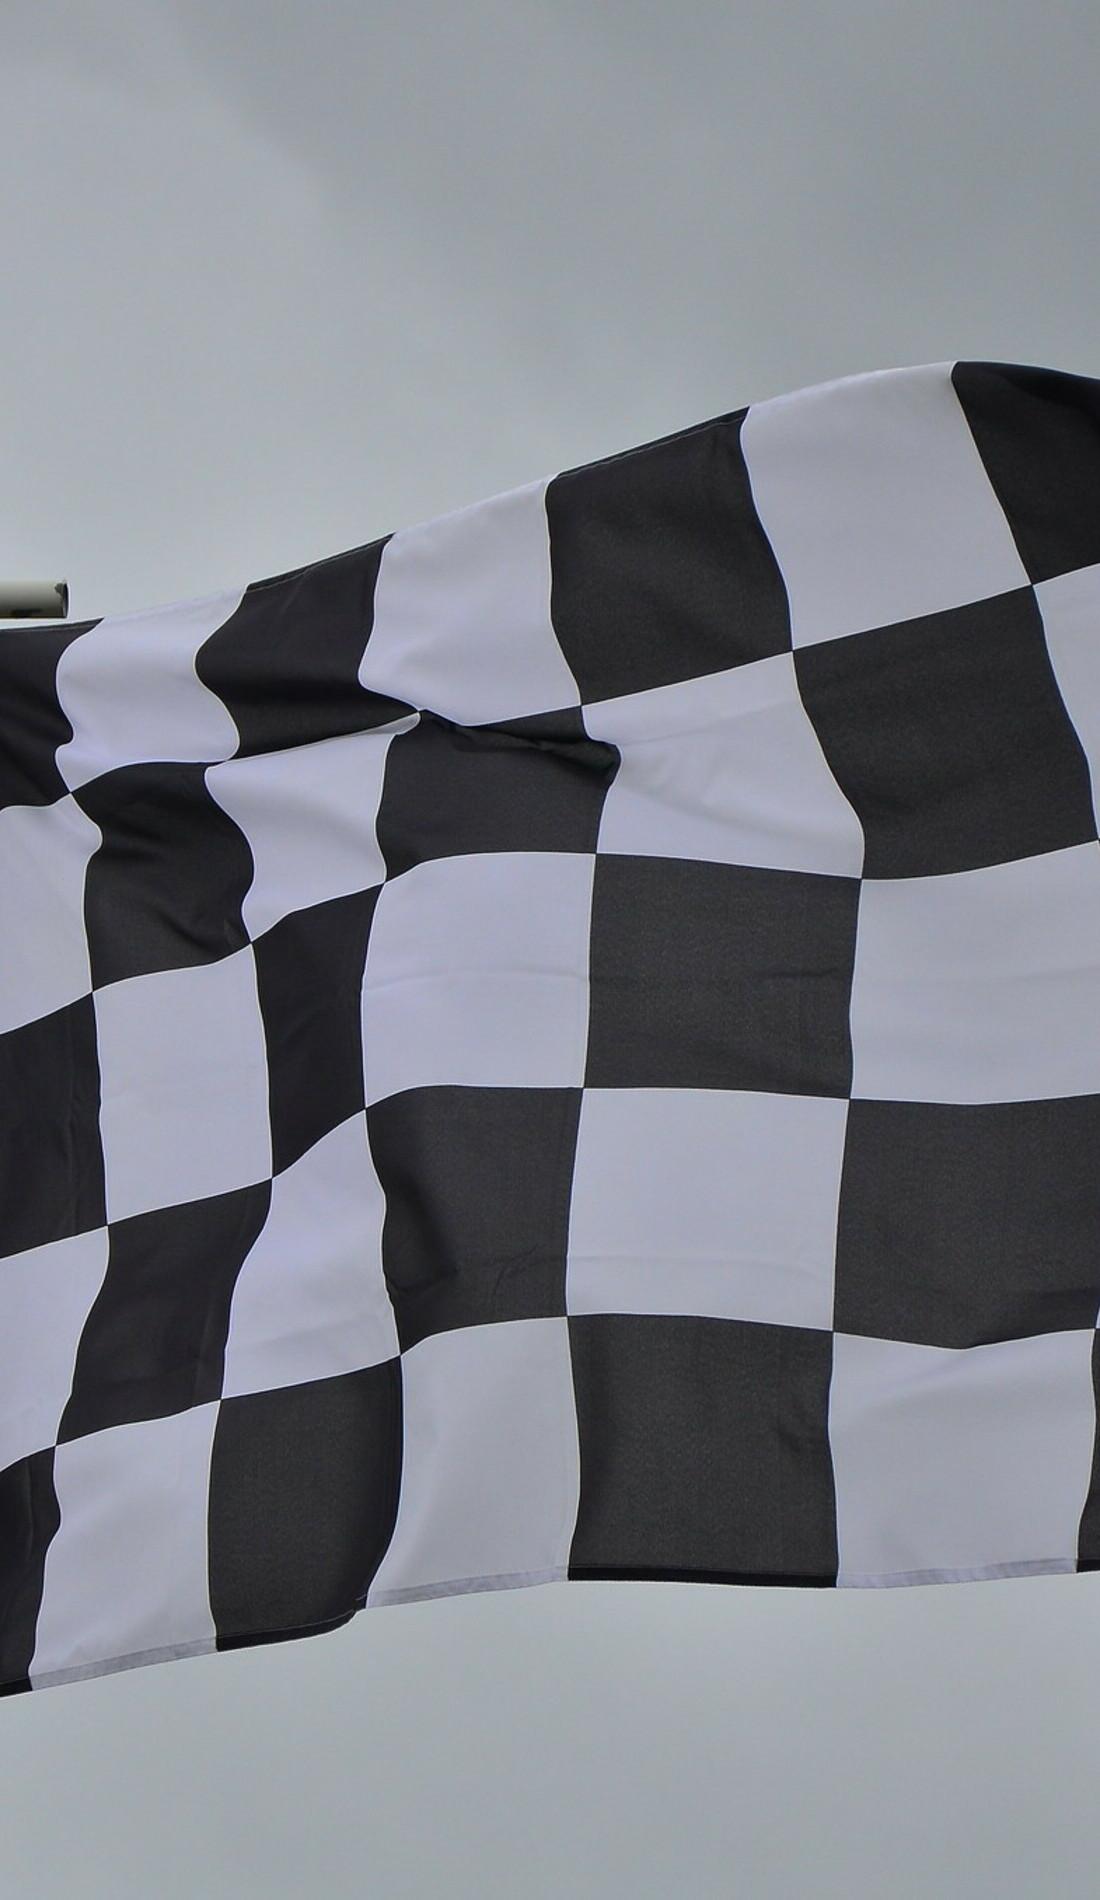 A Grand Prix de Monaco live event